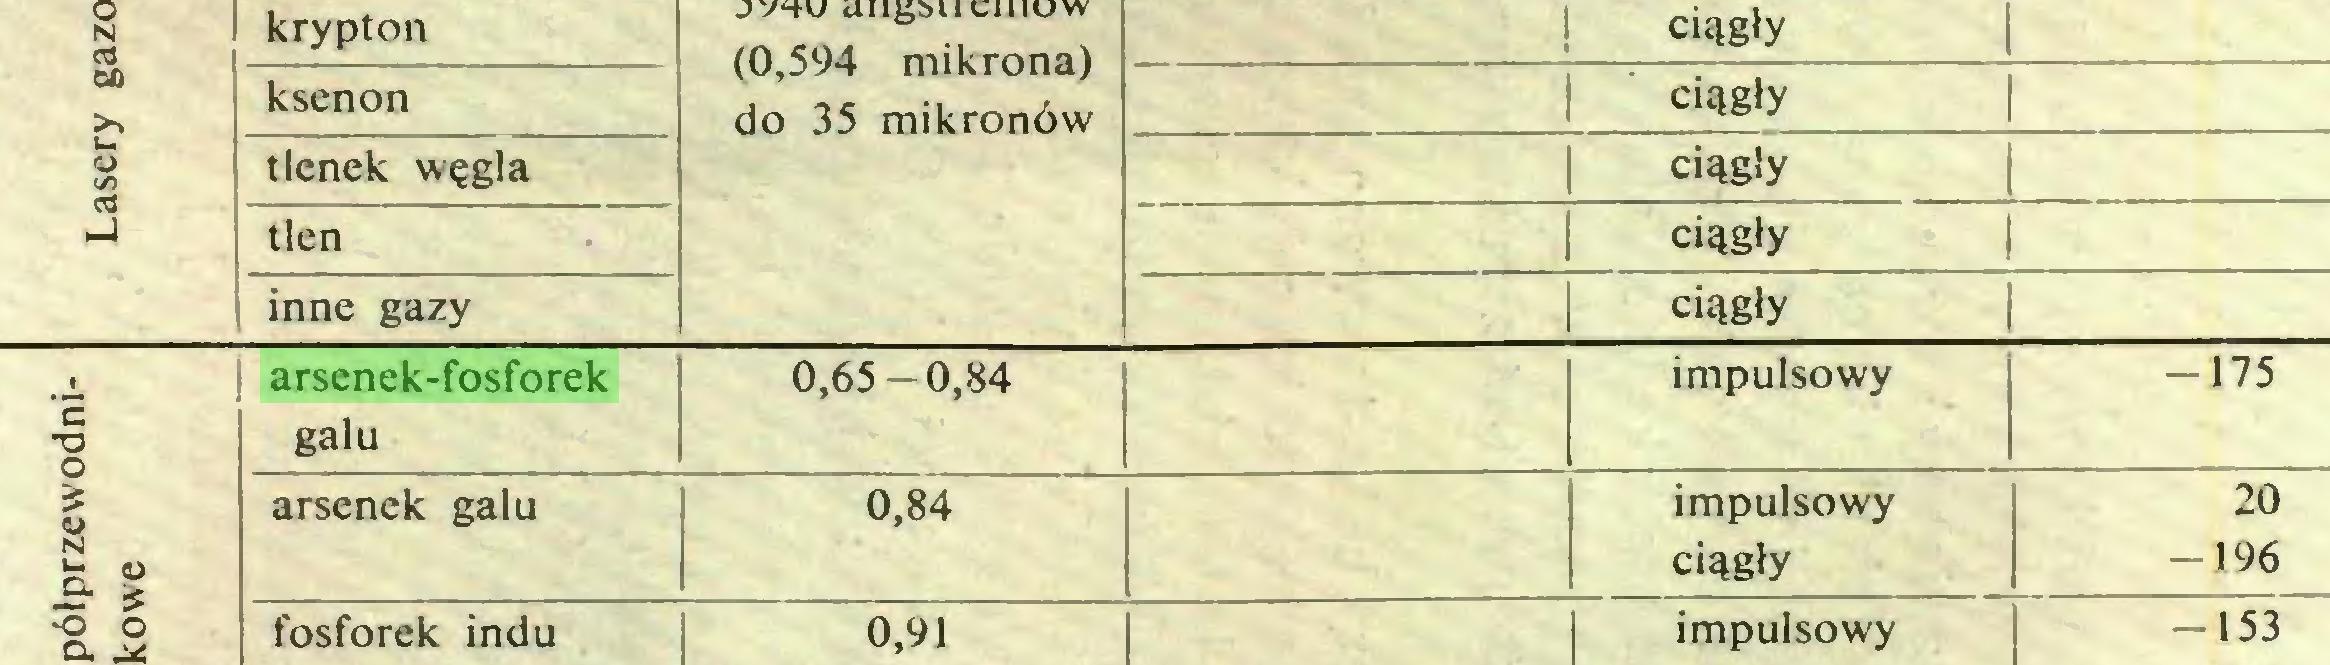 (...) N krypton ! ciągły 60 £ <L> </> cd ksenon   ciągły   tlenek węgla   ciągły tlen   ciągły inne gazy   ciągły 'c TJ arsenek-fosforek galu 0,65-0,84 impulsowy -175 £ fft N w- arsenek galu 0,84 impulsowy ciągły 20 -196 -o o o...